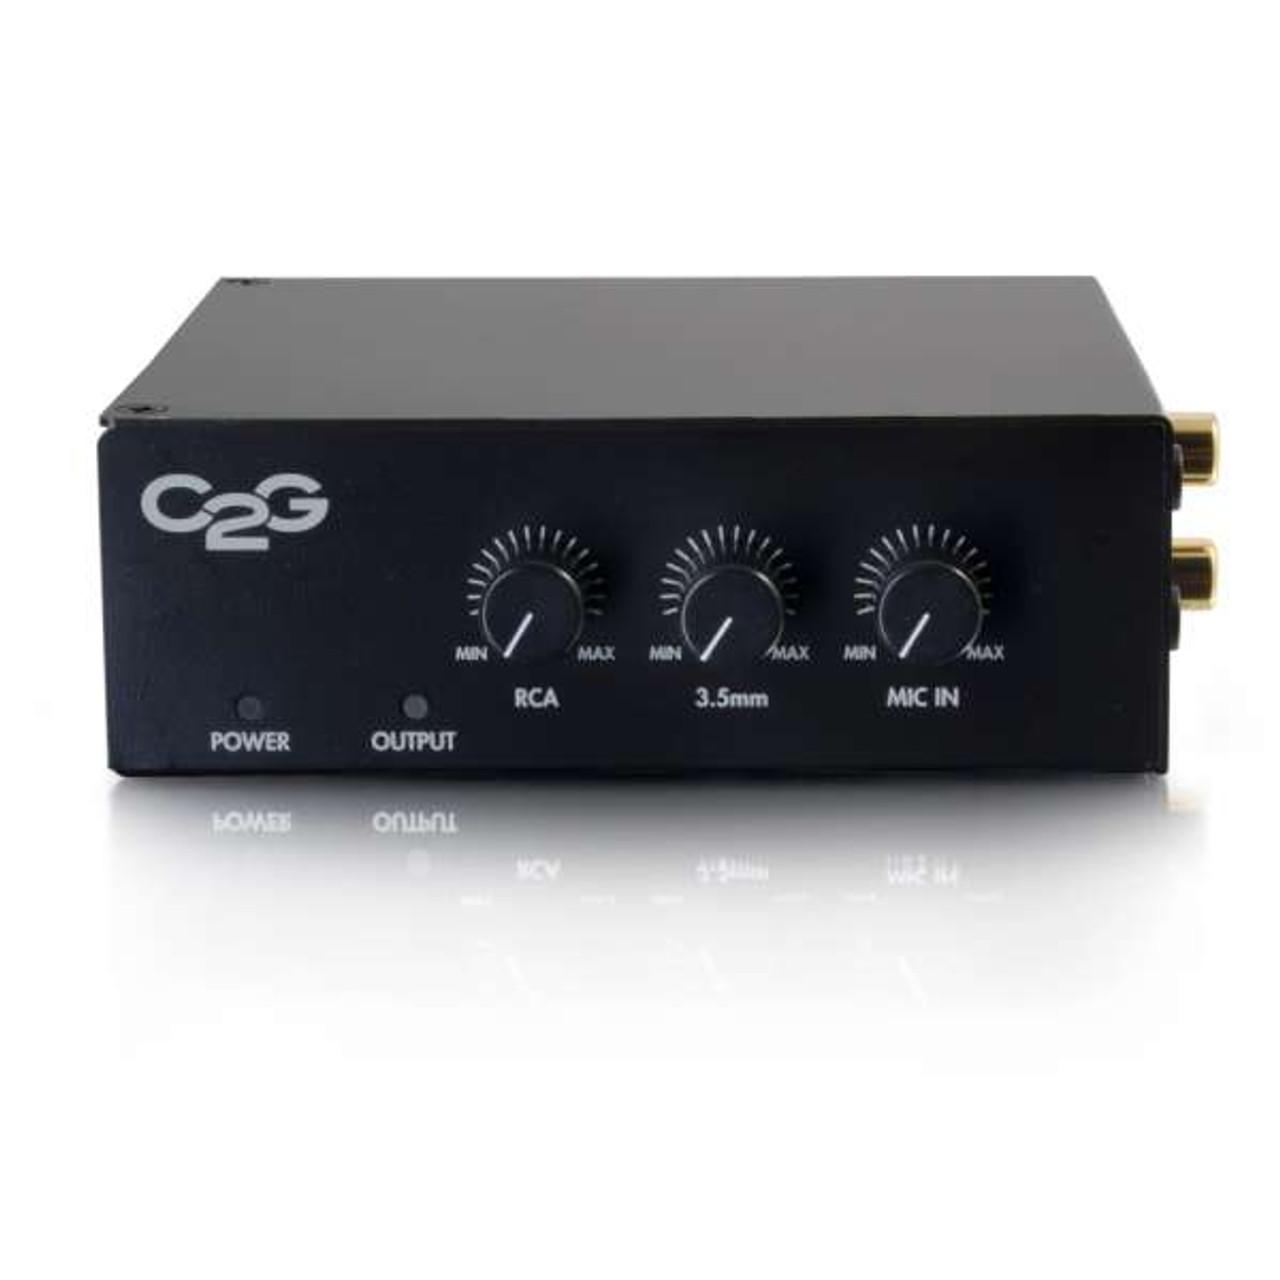 C2G 25/70V 50W AUDIO AMPLIFIER PLENUM RATED (40881)